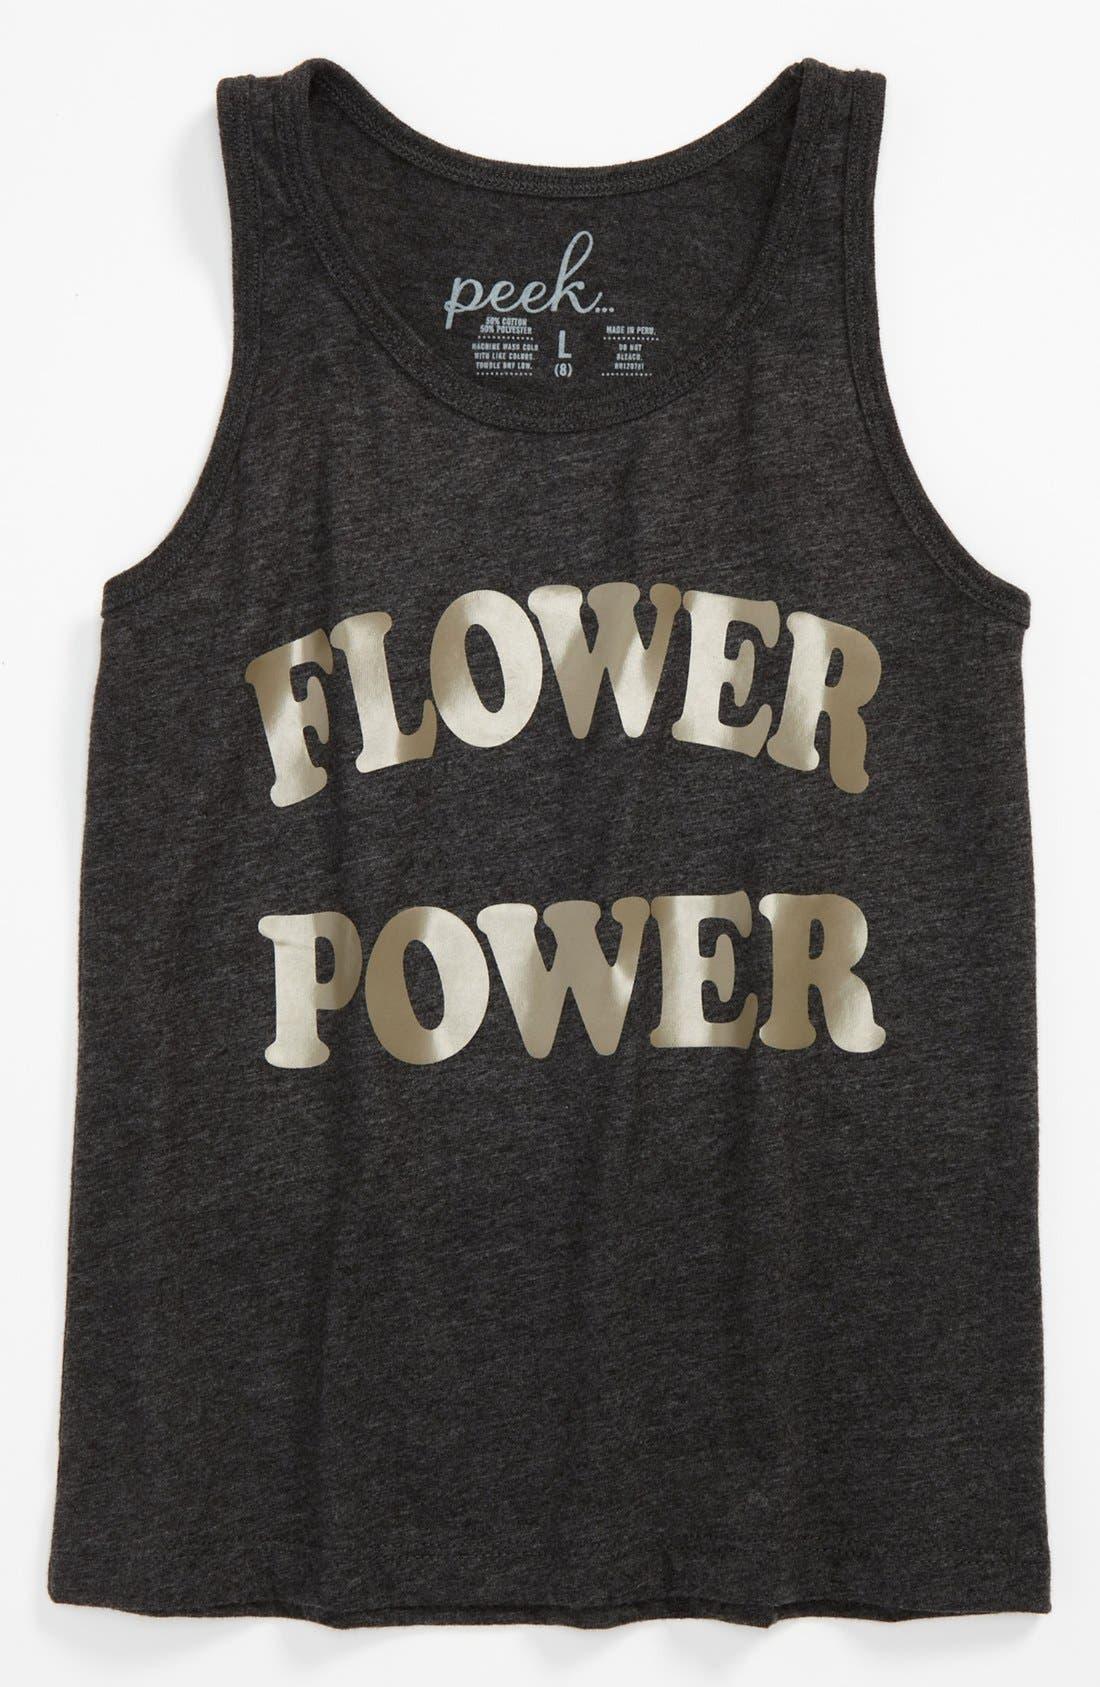 Main Image - Peek 'Flower Power' Tank Top (Toddler, Little Girls & Big Girls)